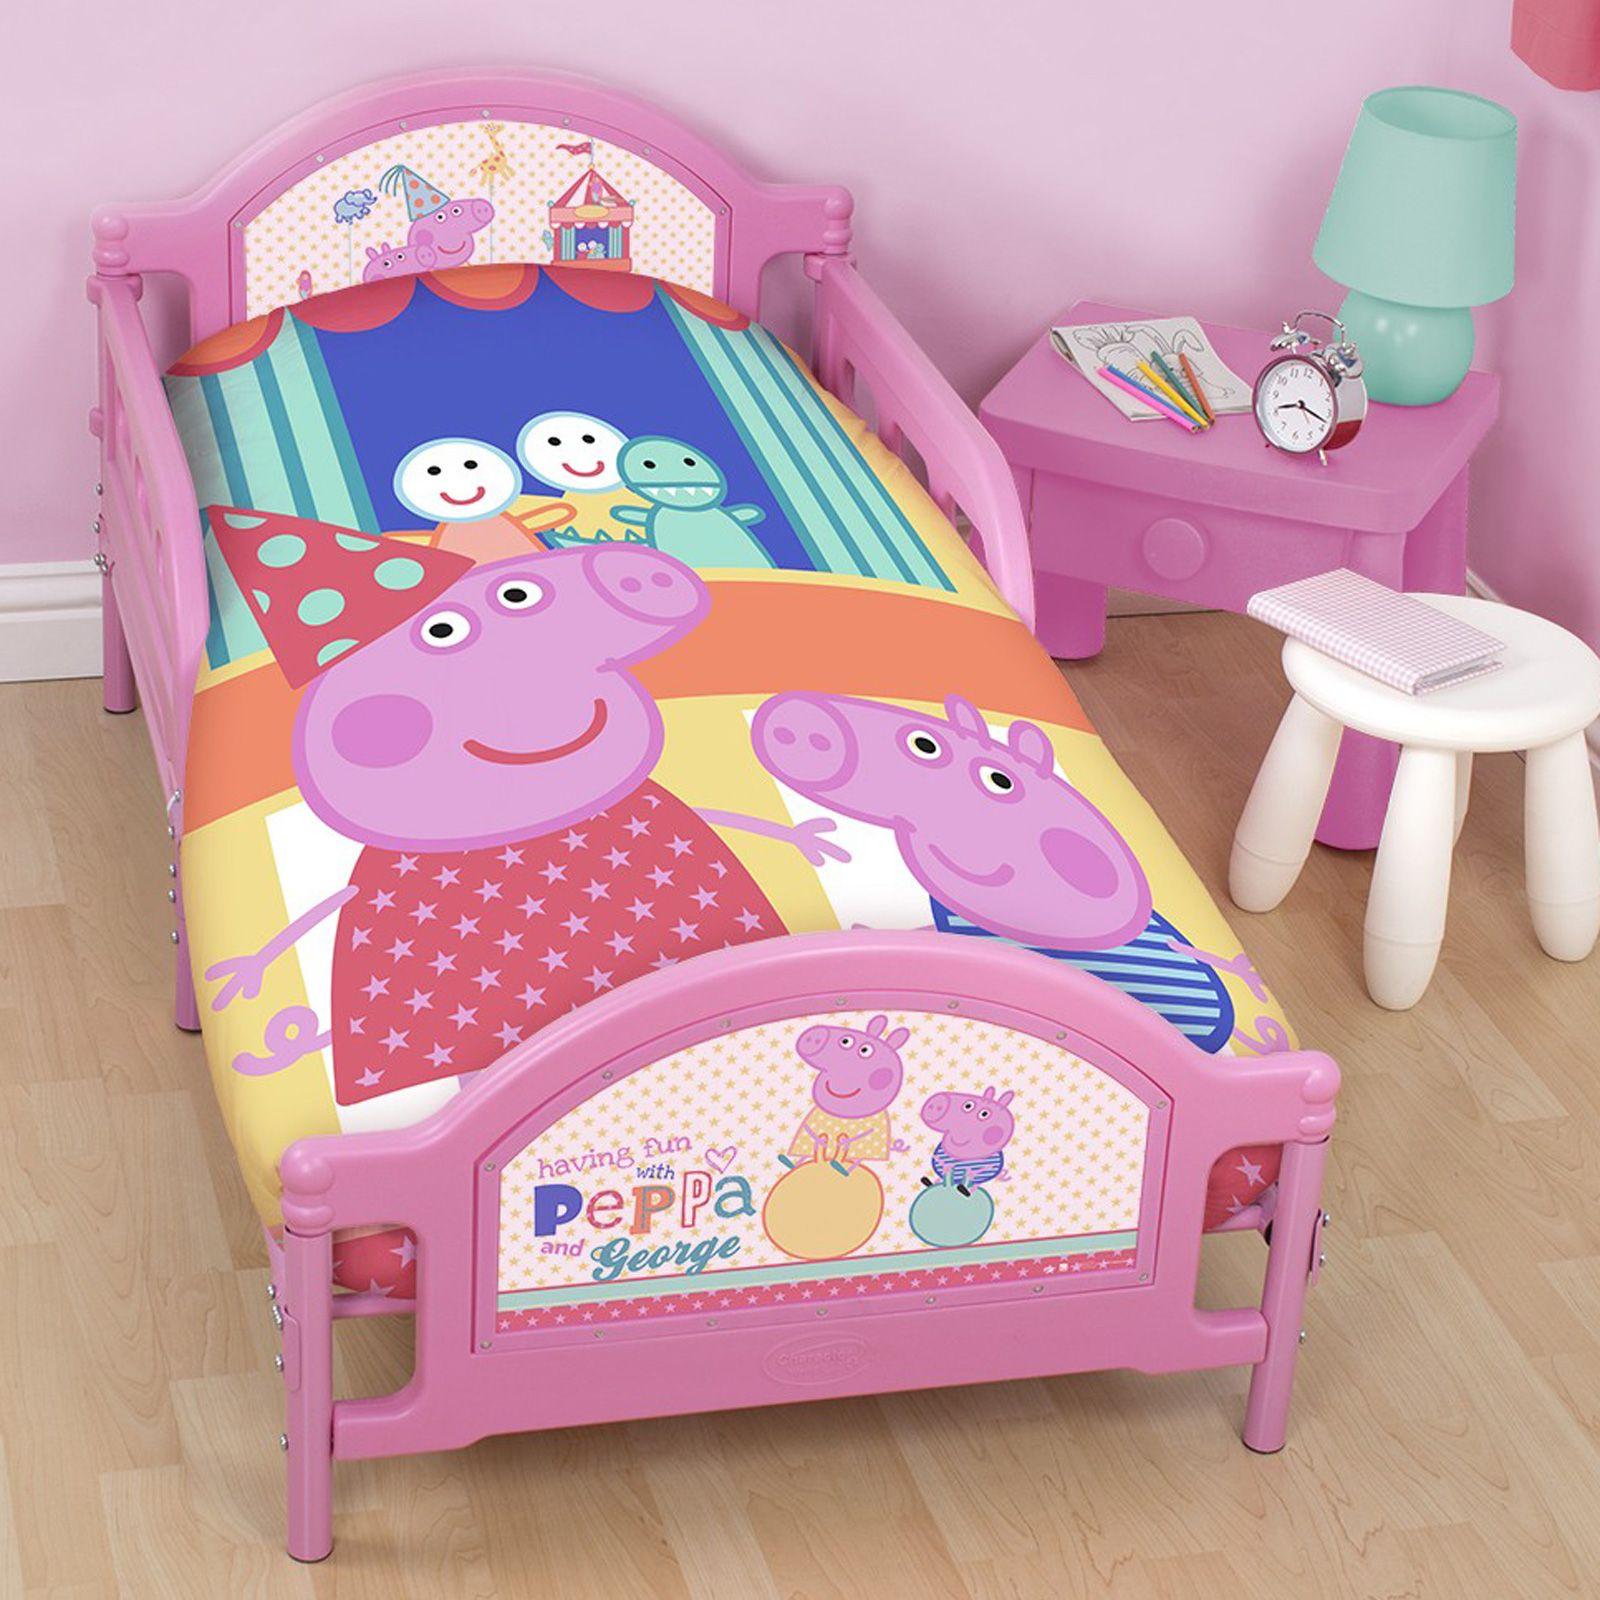 PEPPA PIG 'FUNFAIR' JUNIOR COT BED DUVET COVER NEW OFFICIAL   eBay